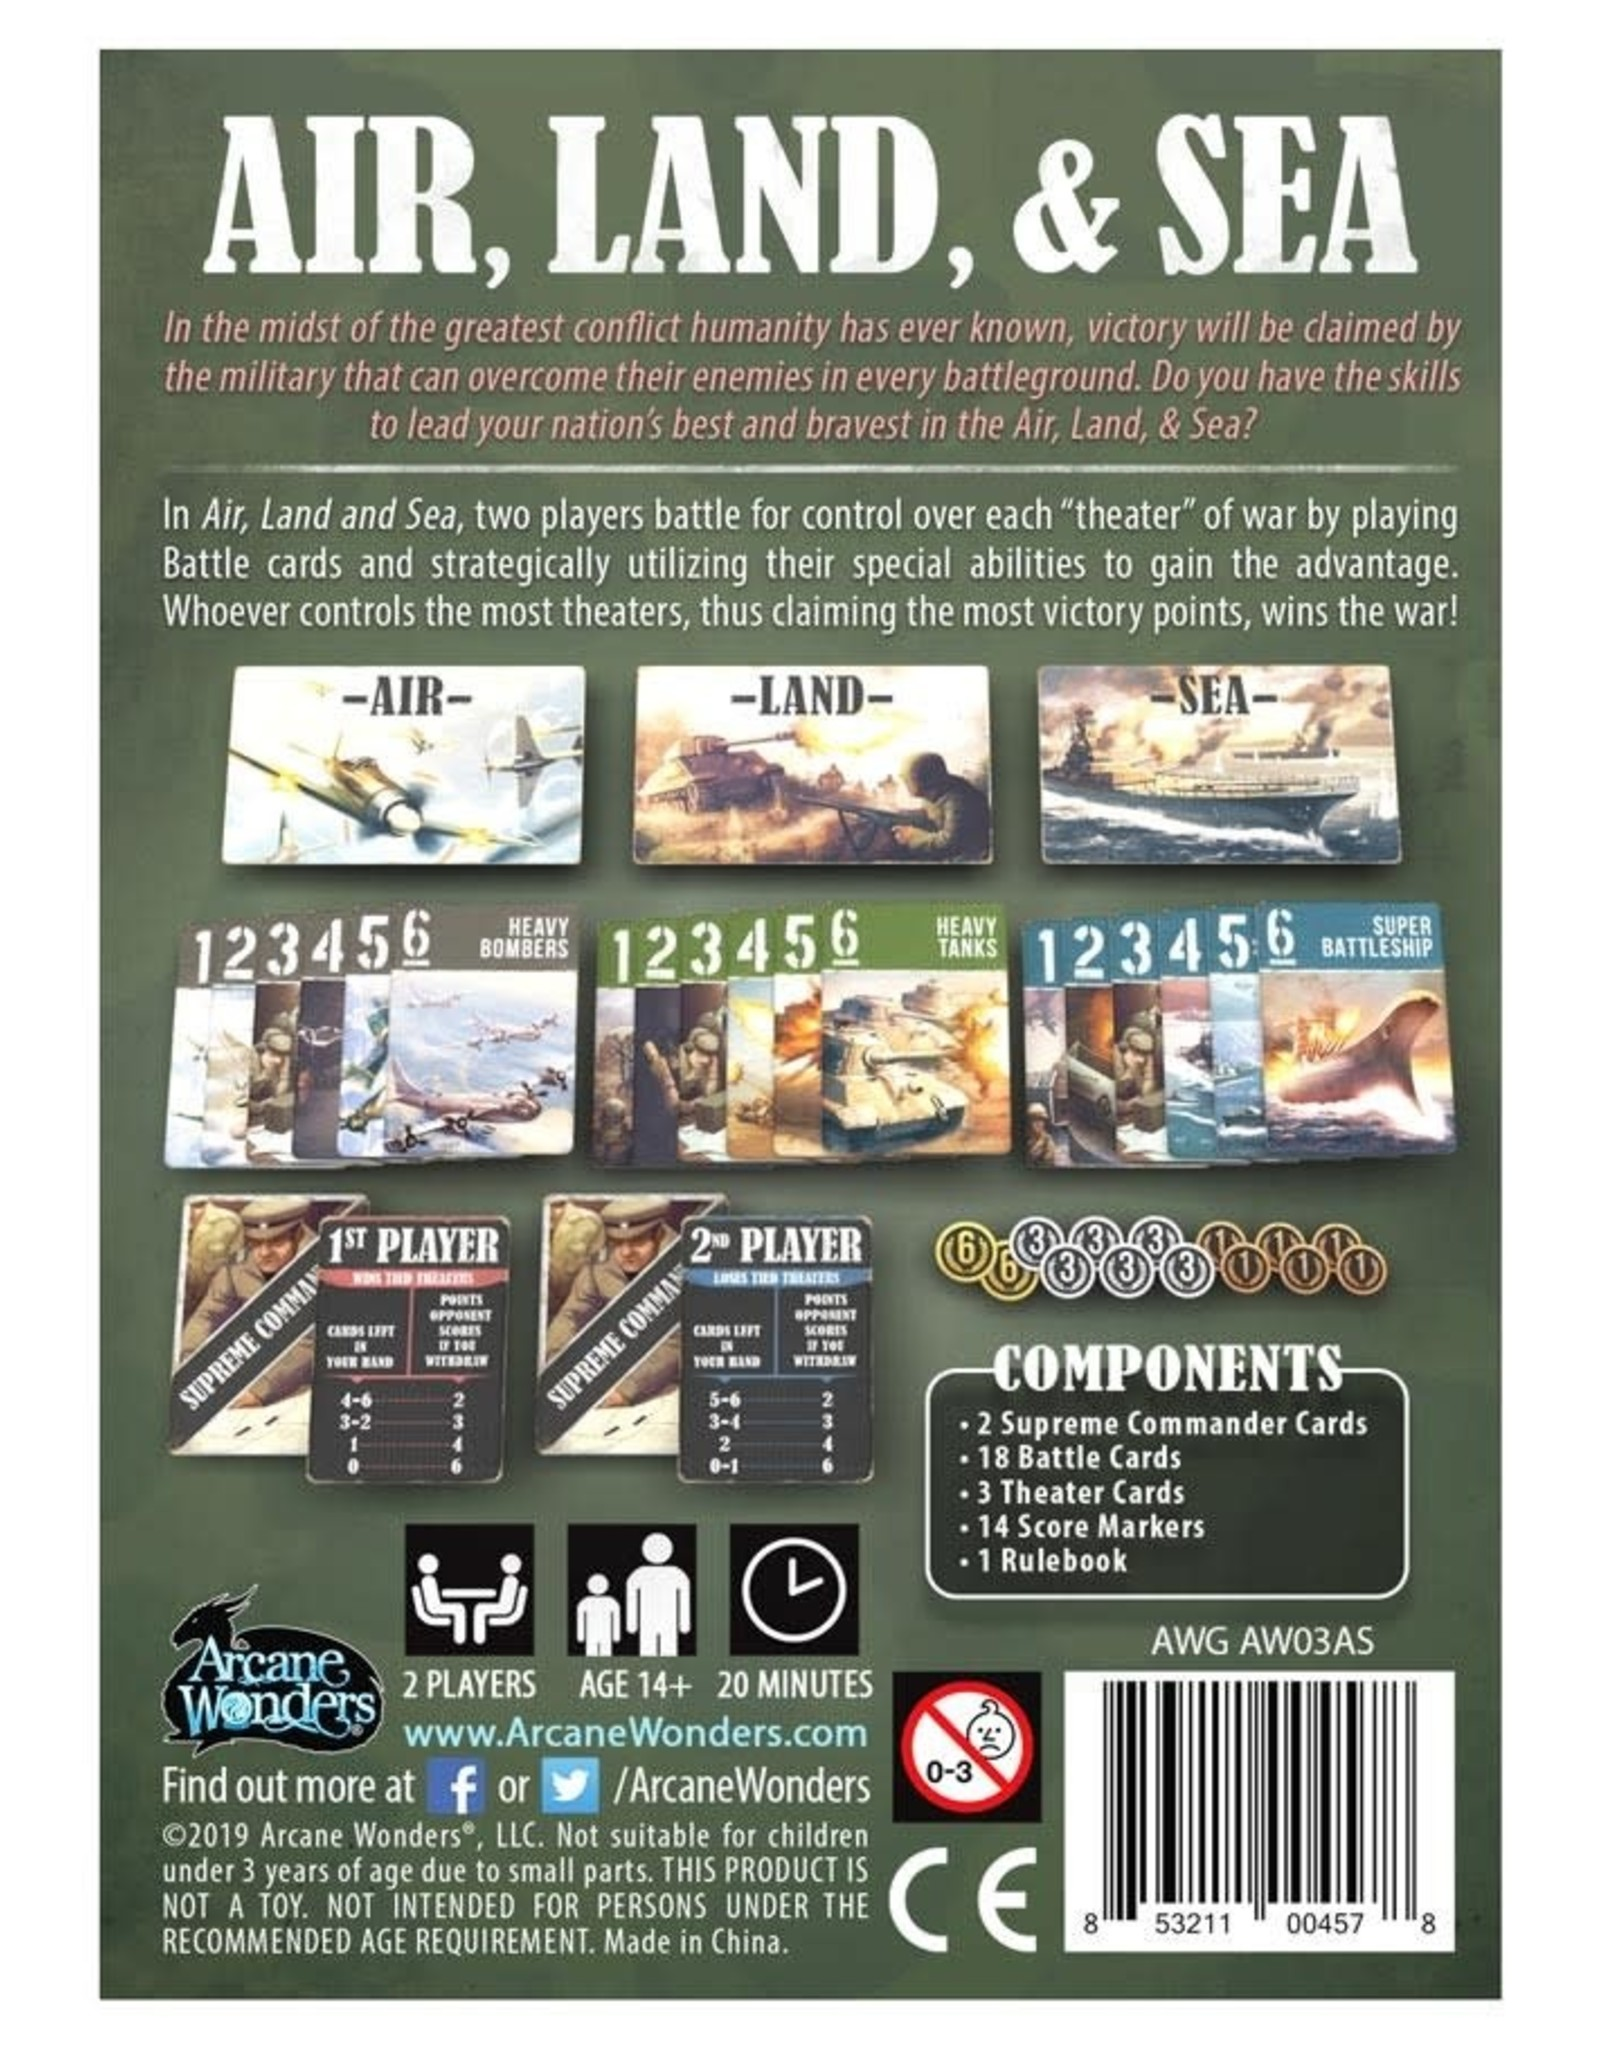 Arcane Wonders Air Land and Sea